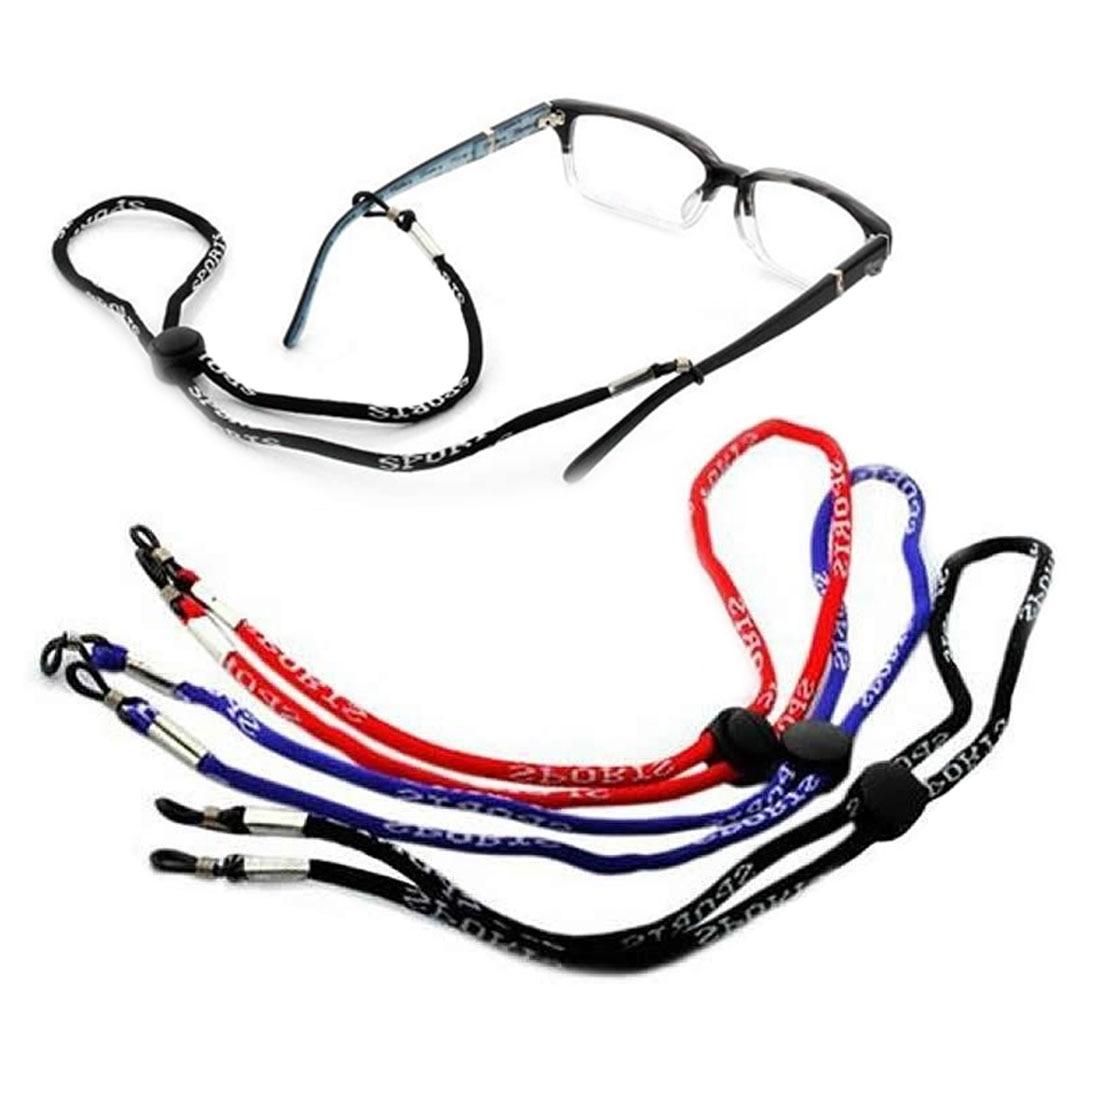 Adjustable  Elastic Glasses String Cord  Neck Rope Strap Sunglasses For Men Women Children Eyewear Lanyard Eyewear Accessories